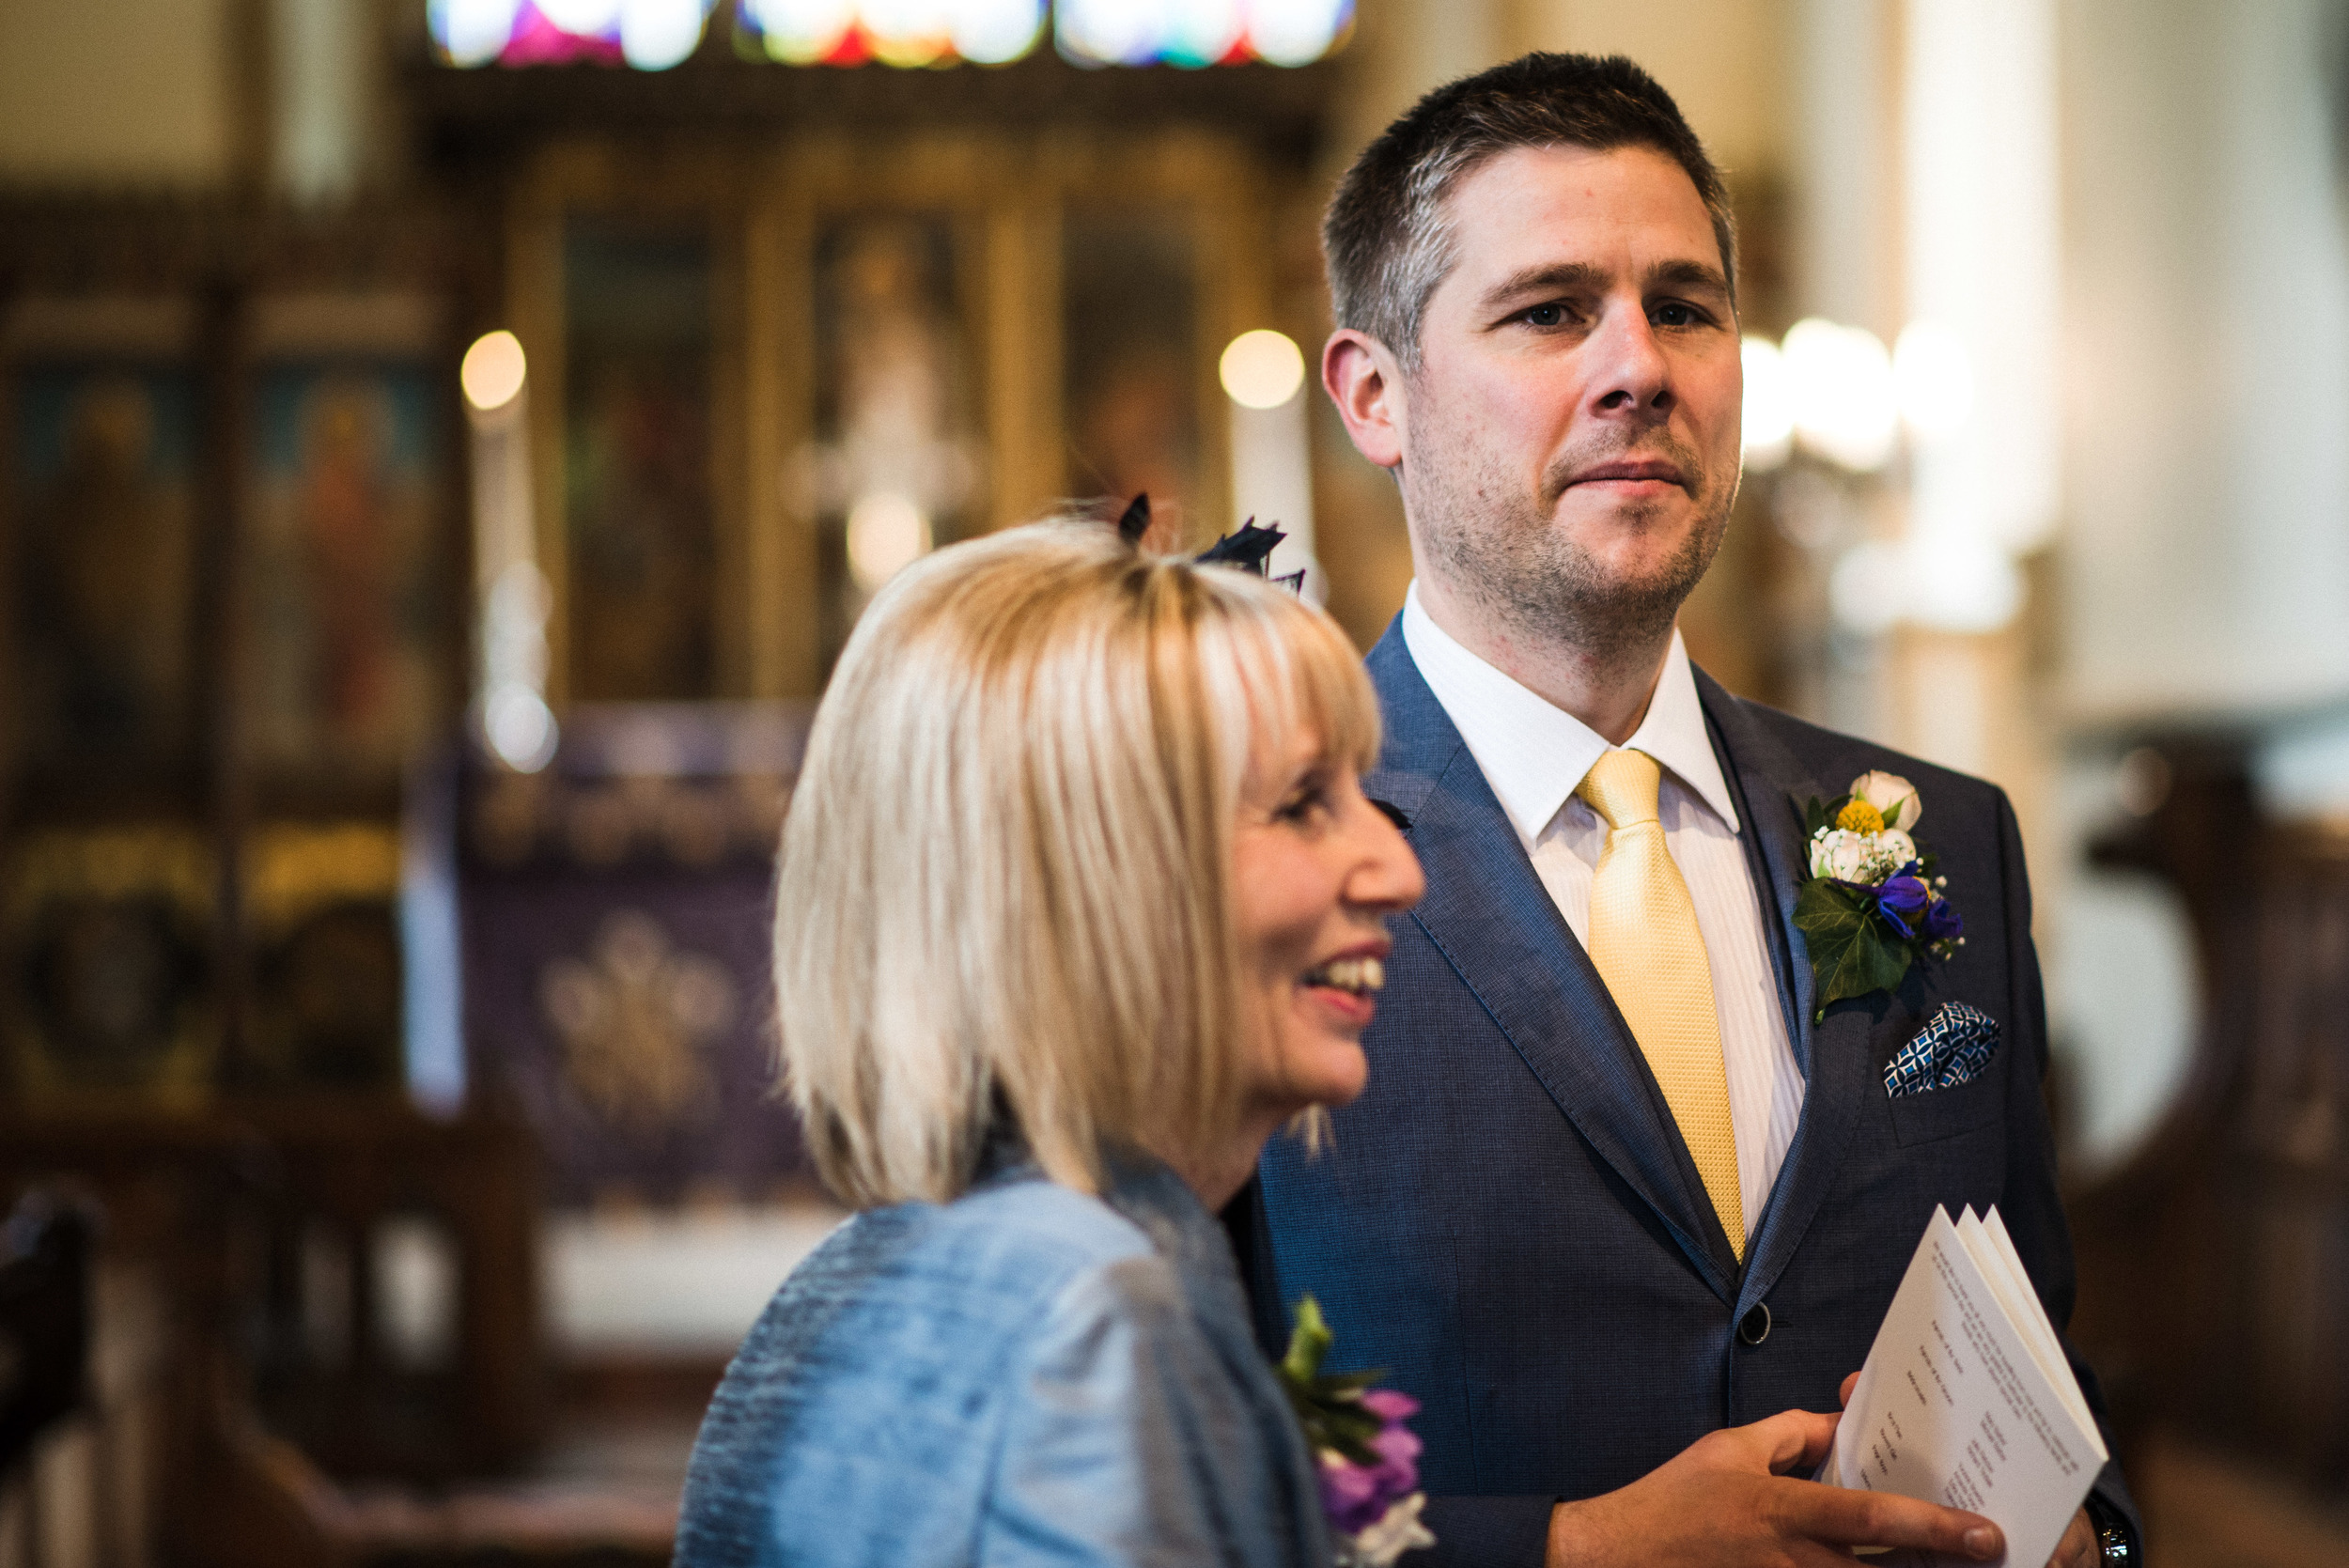 Michelle & James wedding photos-85.jpg